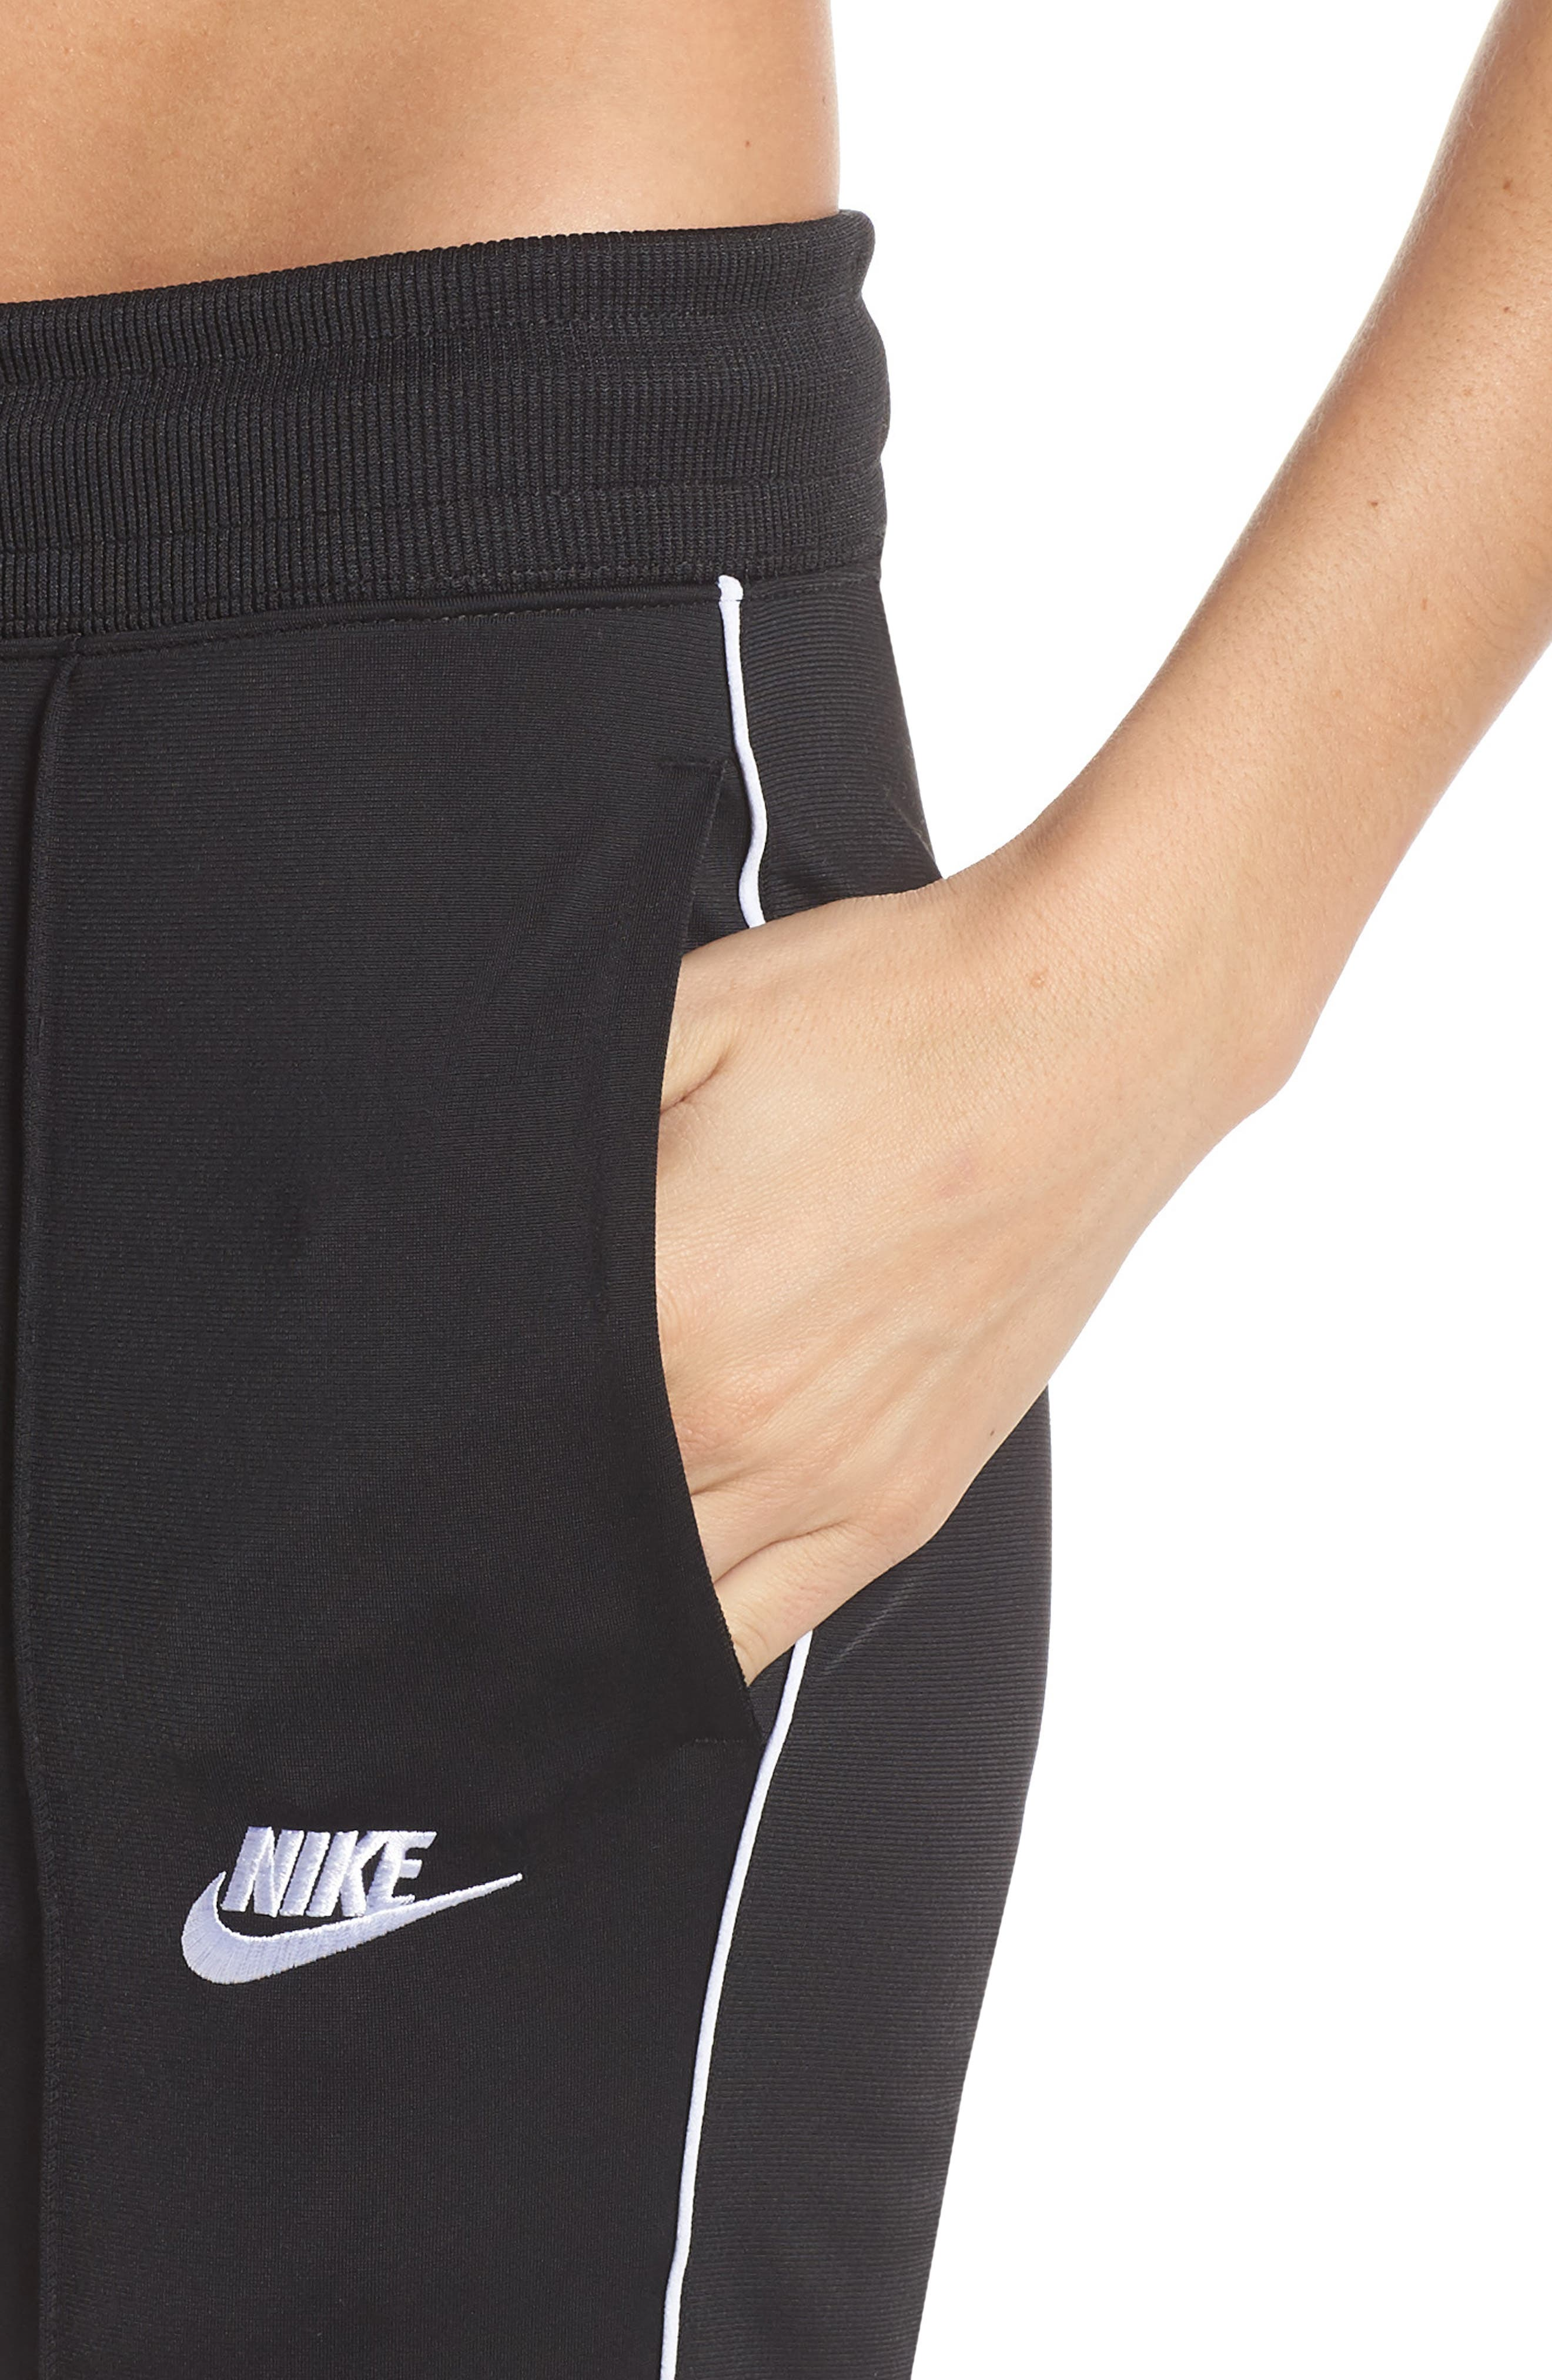 NIKE, NSW Slim Crop Pants, Alternate thumbnail 5, color, BLACK/ WHITE/ WHITE